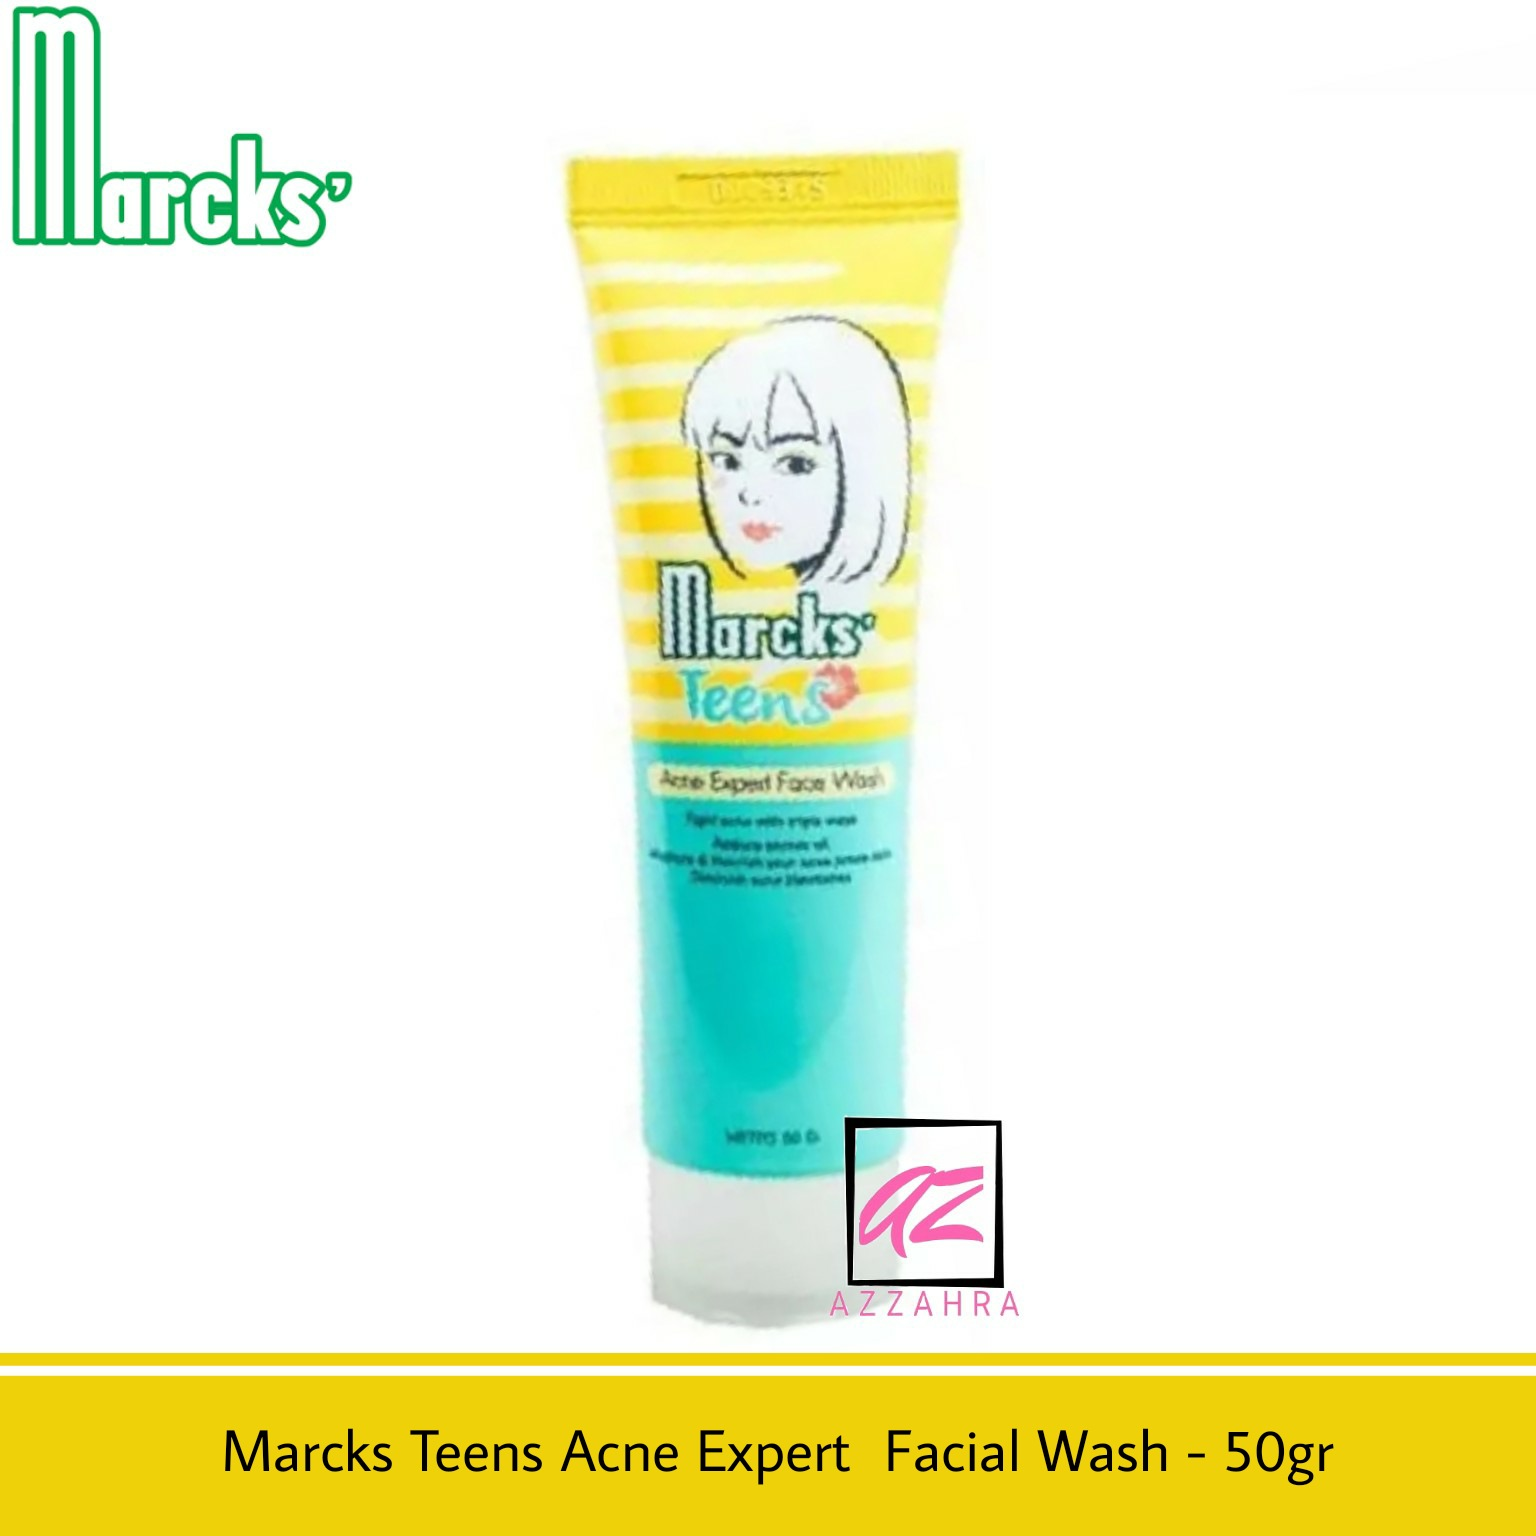 marcks teens acne expert facial wash – 50gr